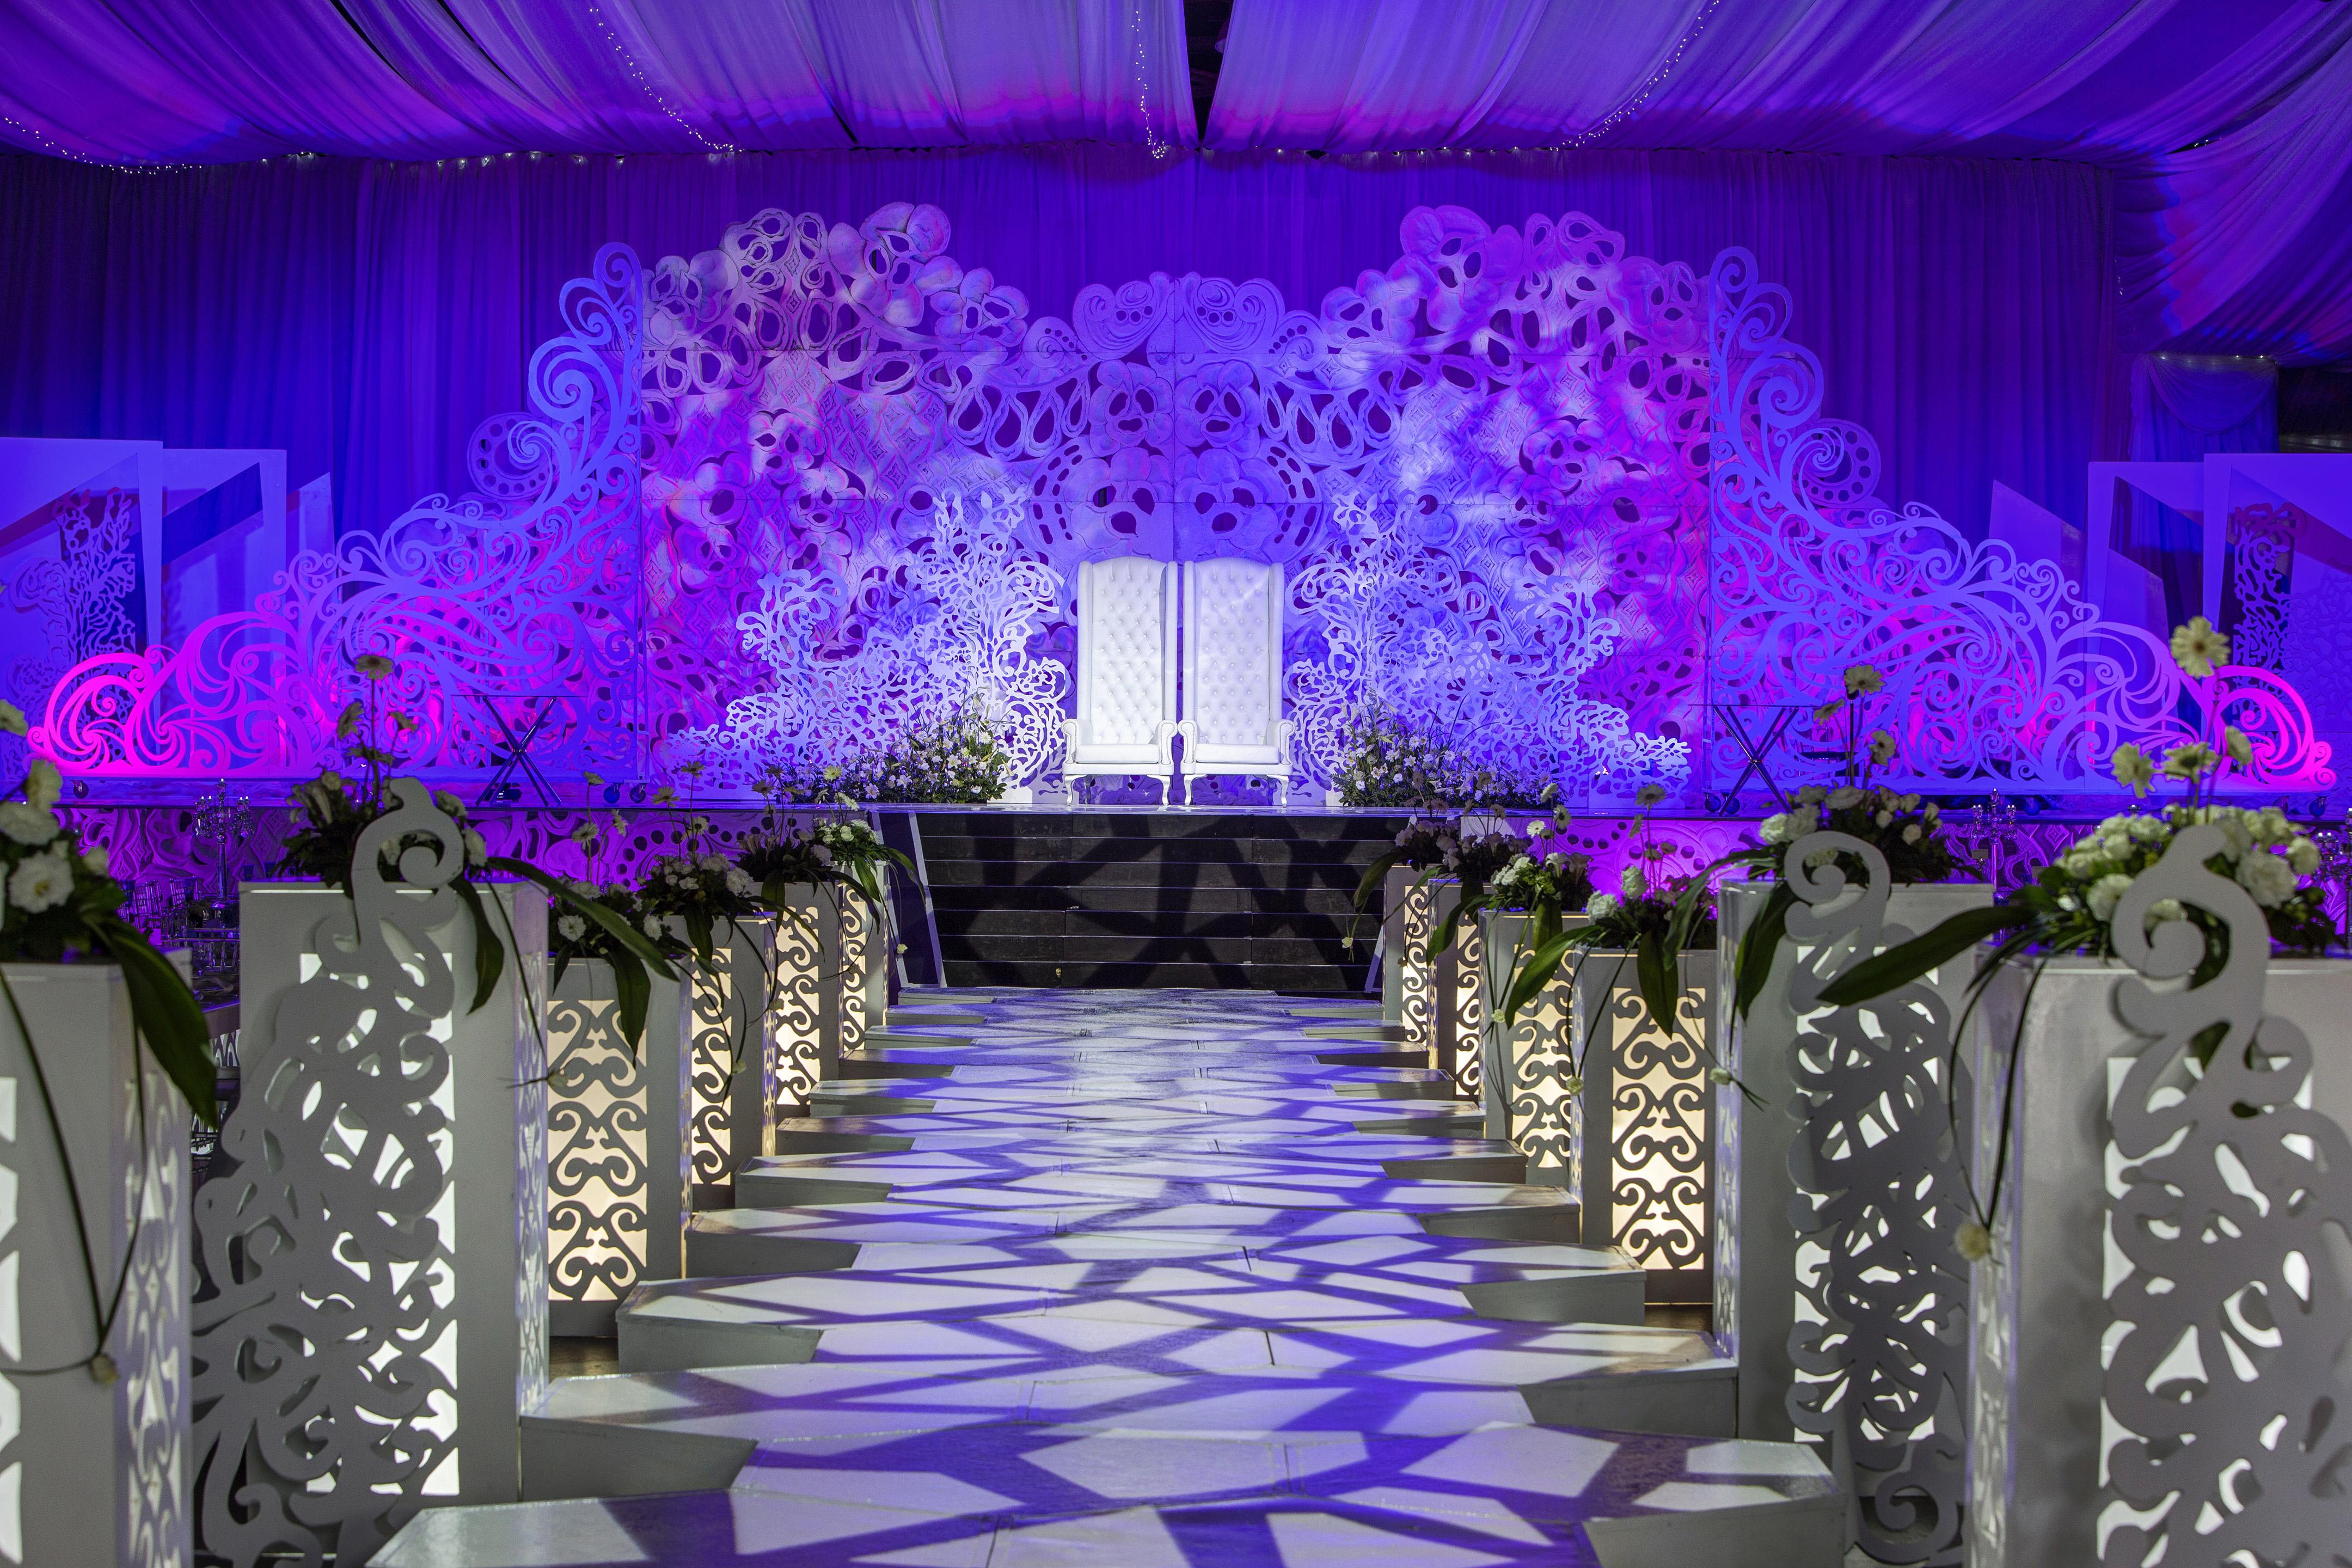 Muslim Wedding Decor Company Based In Durban Koogan Pillay